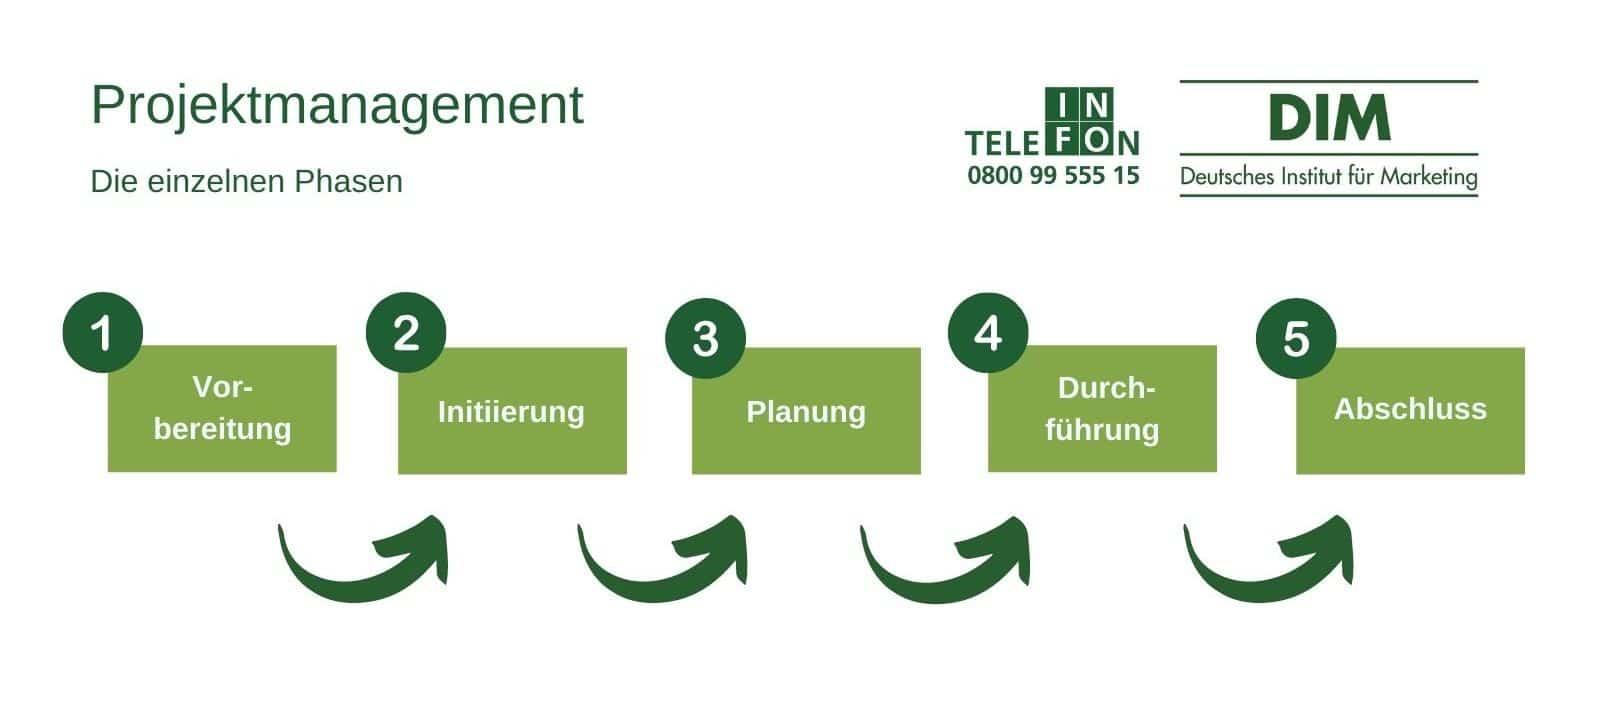 Projektmanagement Phasen